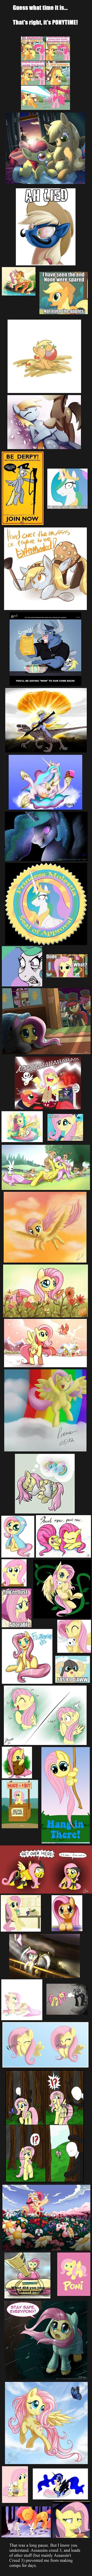 Ponycomp 204. Ponycomp 203: /channel/ponytime/Ponycomp+203/MqBiGZd/ DOWNLOAD LINK: docs.google.com/folder/d/0B4SOCzXHPRDVcHpUMDh5eVh3QTQ/edit.. Needs moar Spitfire. My Little Pony ponies ponytime